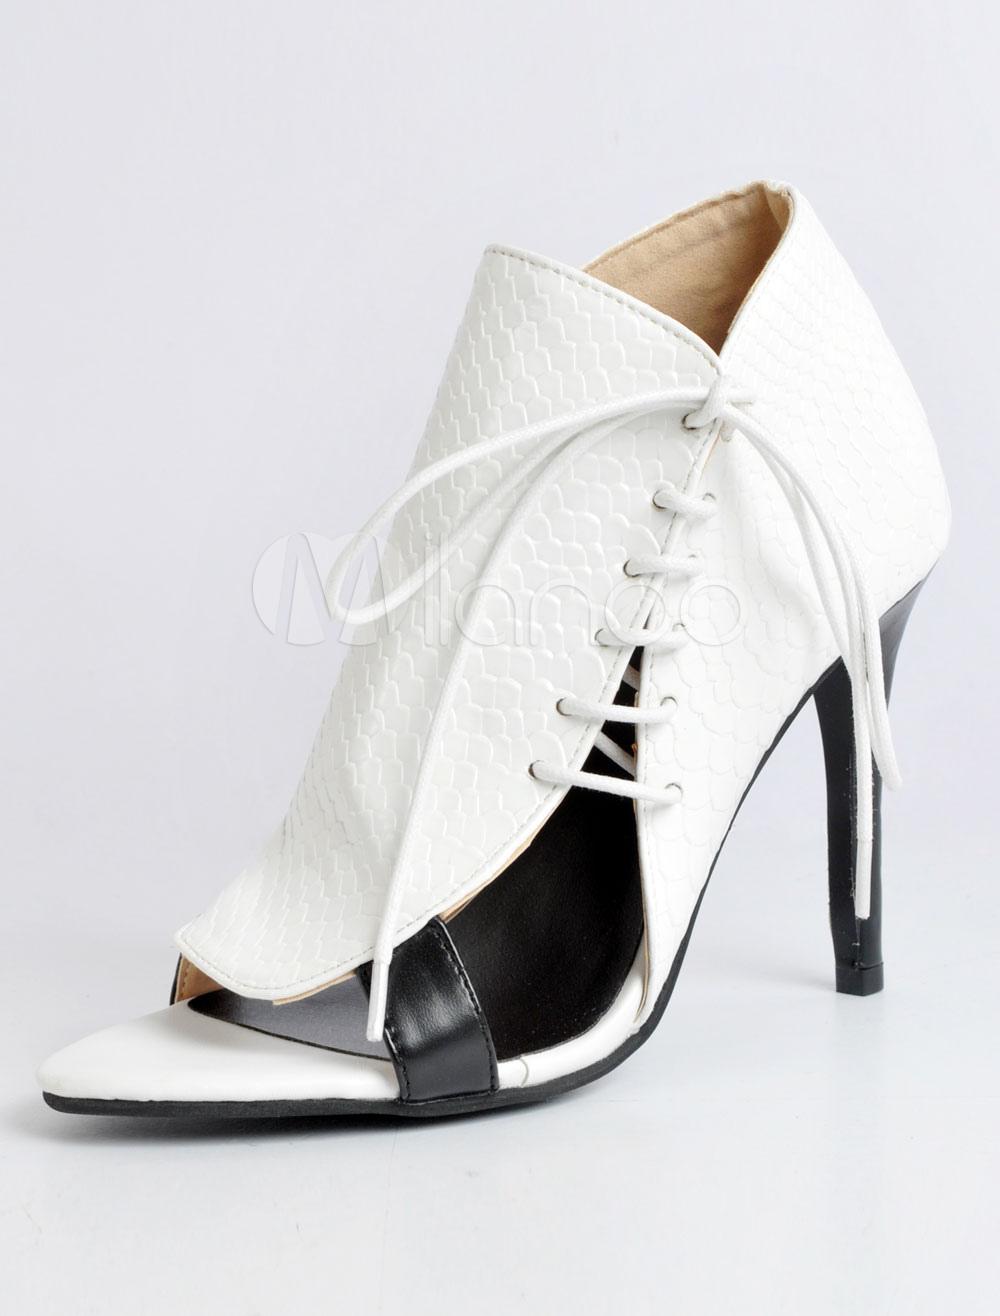 f2f62295d White Sandal Booties High Heel Stiletto Open Toe Lace Up PU Women's ...